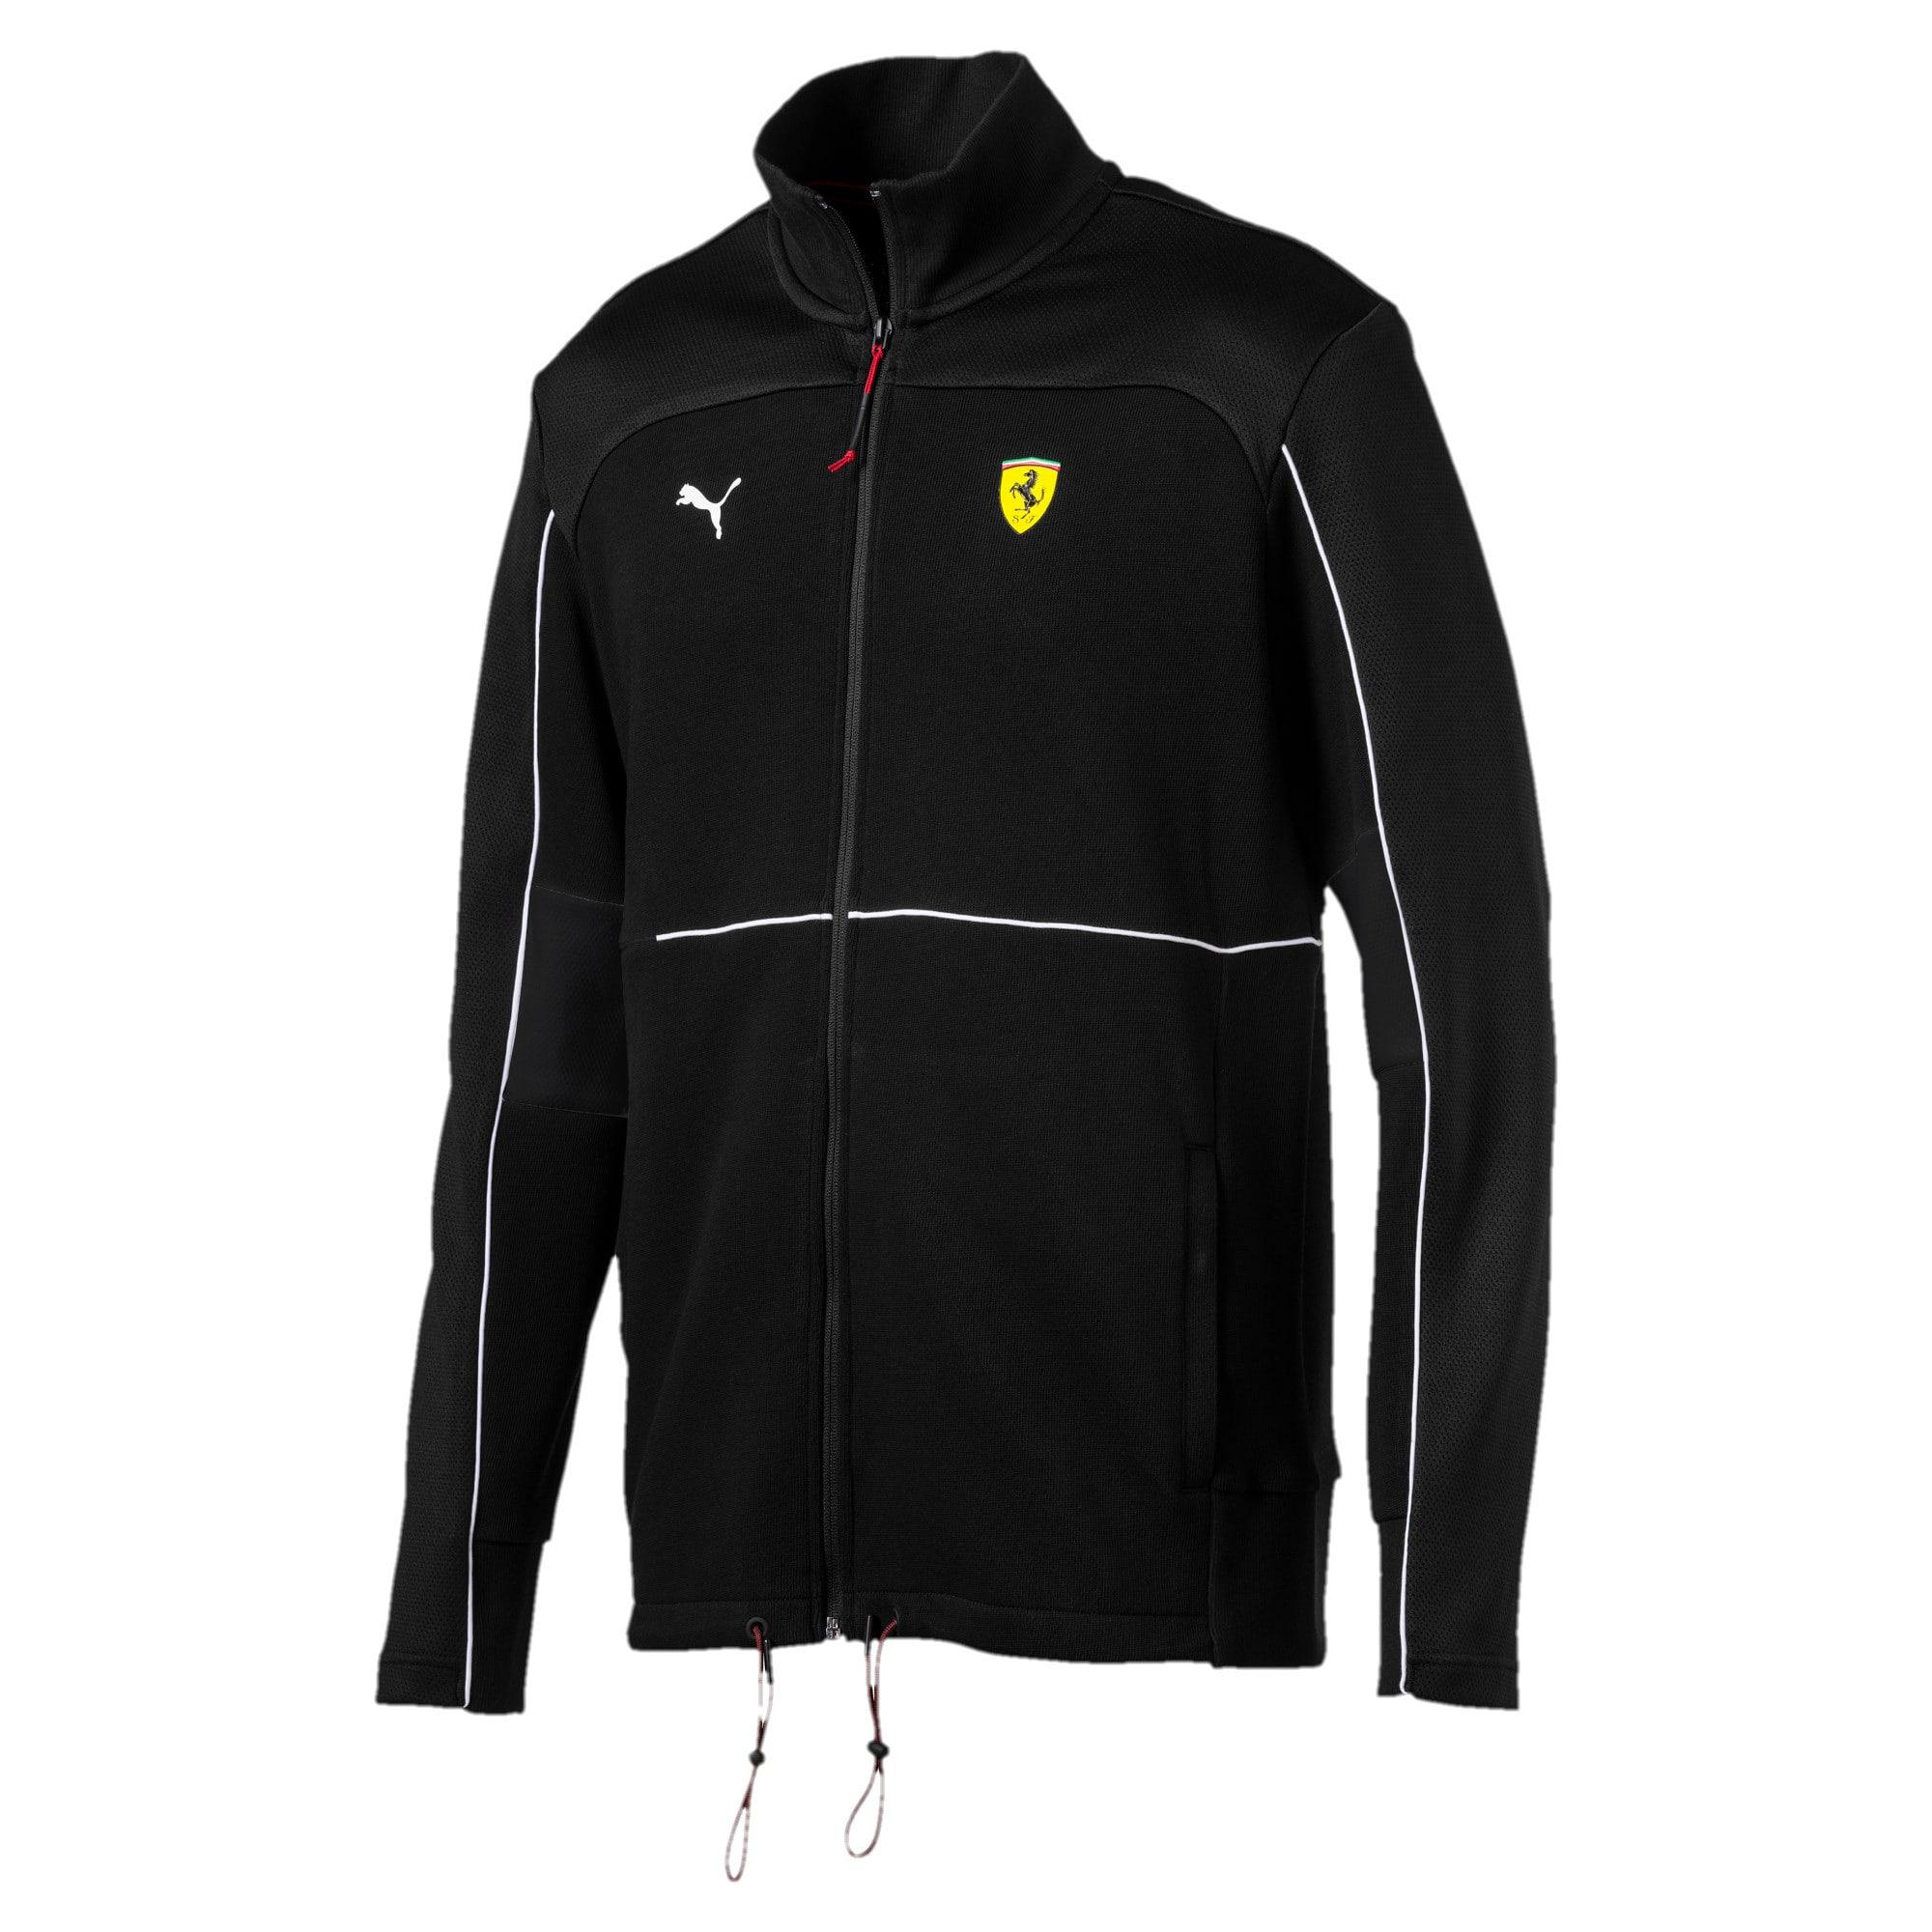 Thumbnail 2 of Scuderia Ferrari Sweat Jacket, Puma Black, medium